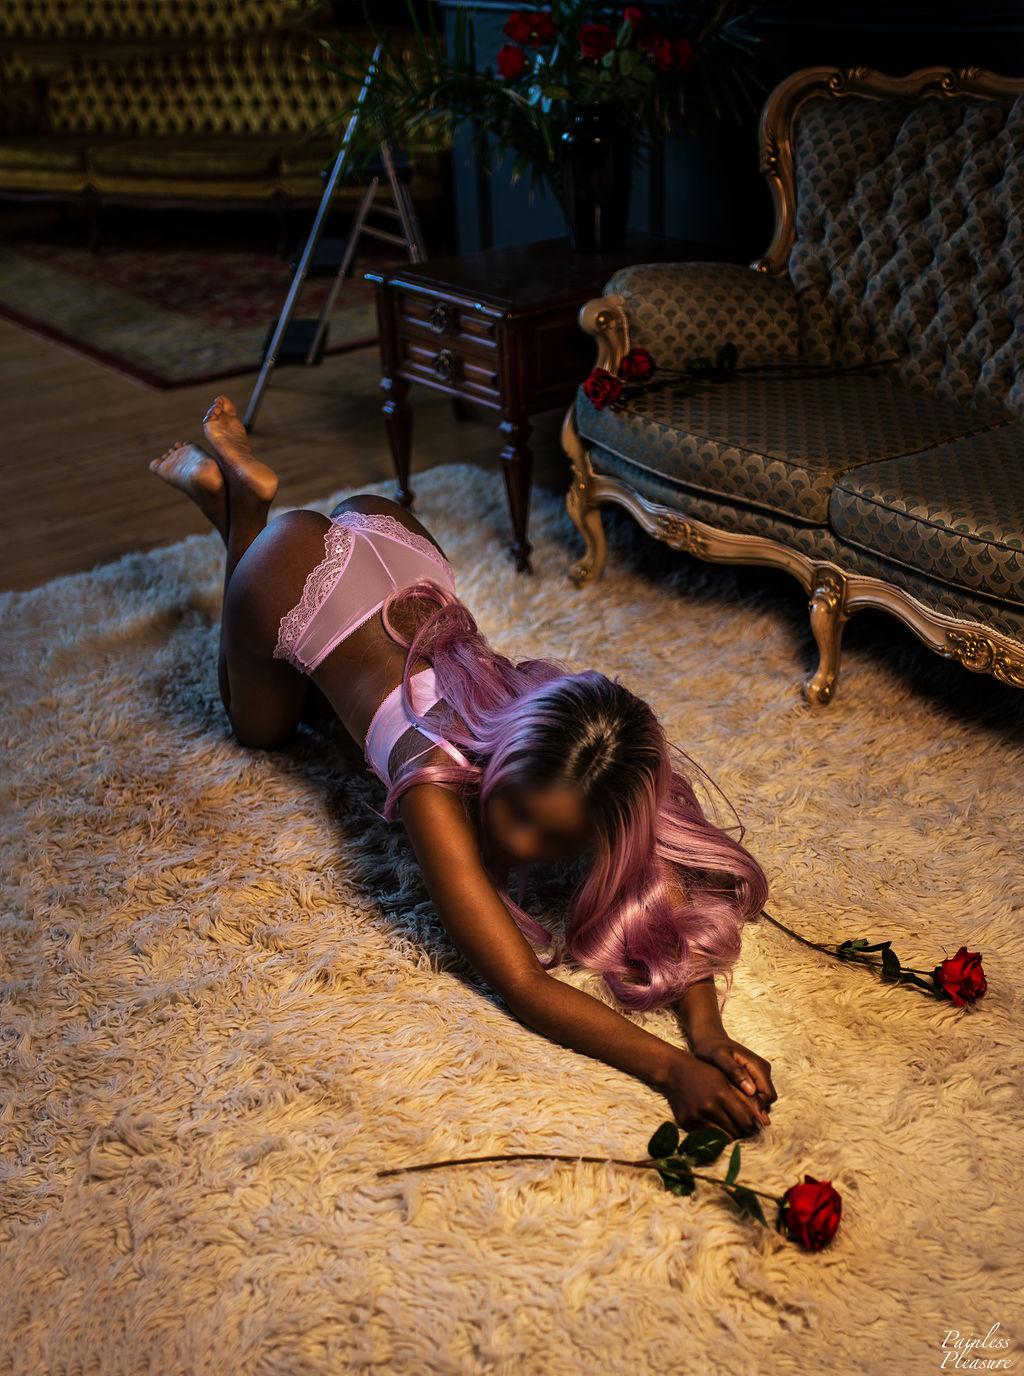 Elizabeth Lorde Upscale Toronto Ebony Companion, Escort, Courtesan